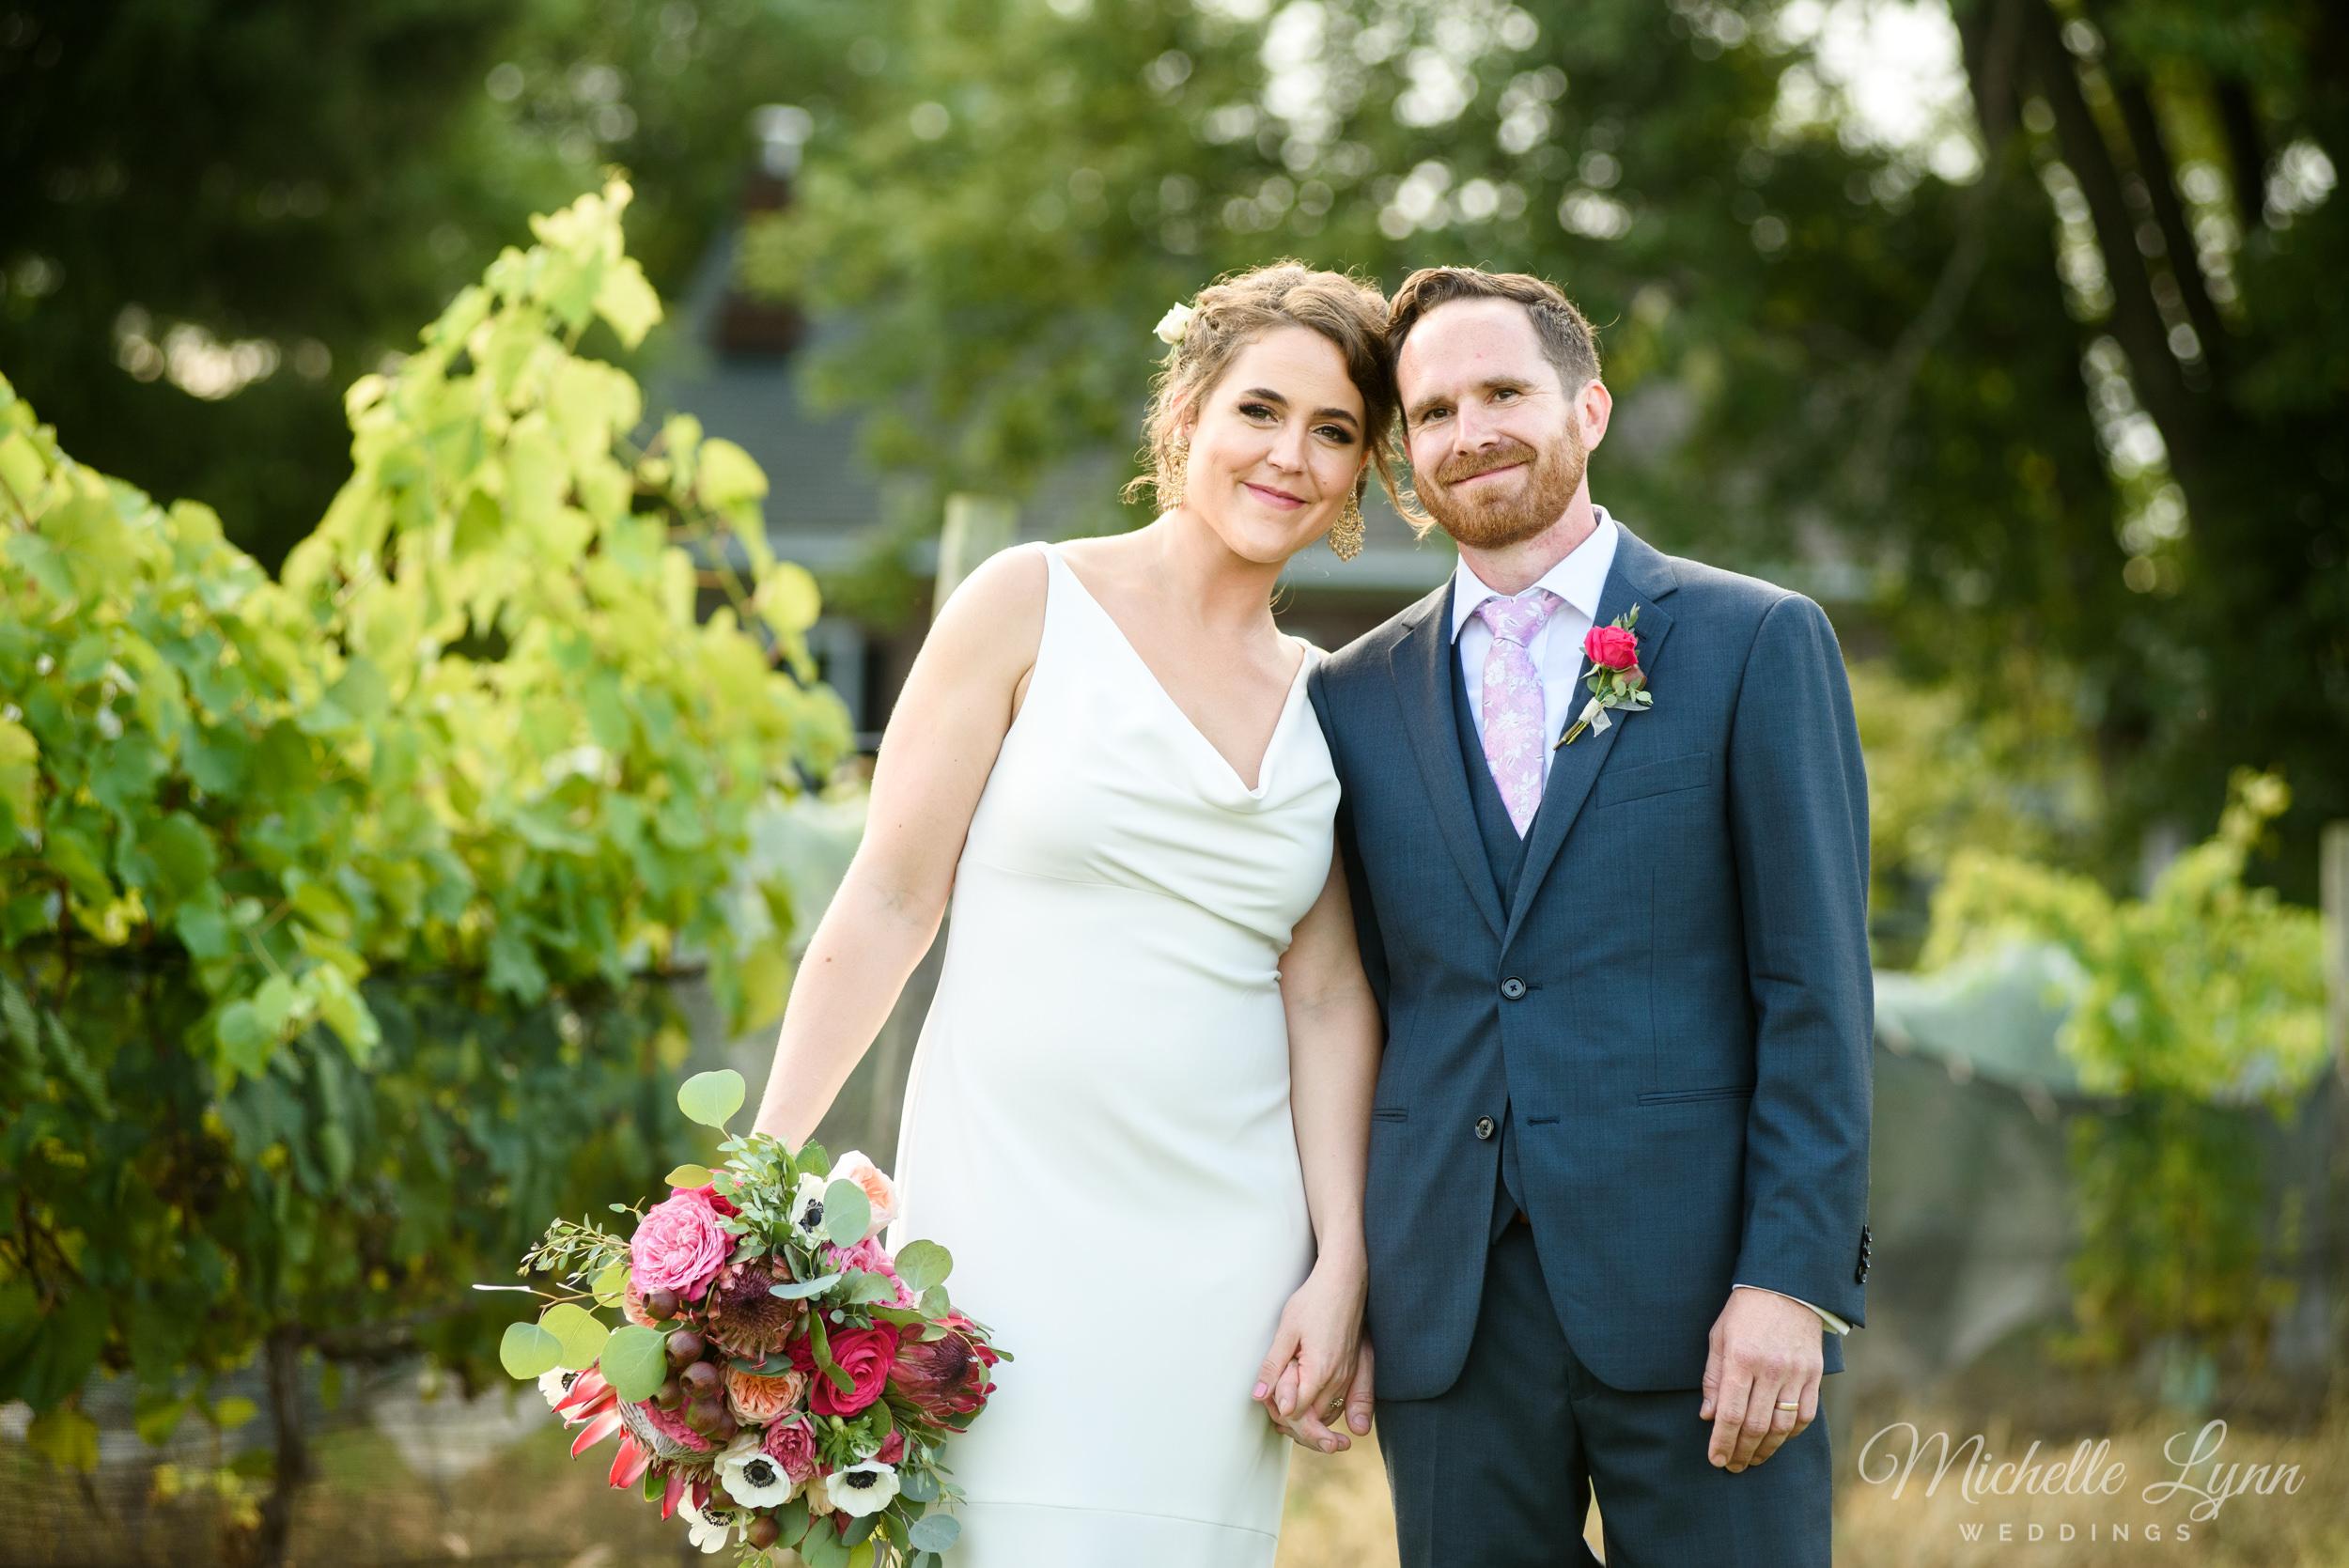 mlw-unionville-vineyards-nj-wedding-photography-65.jpg